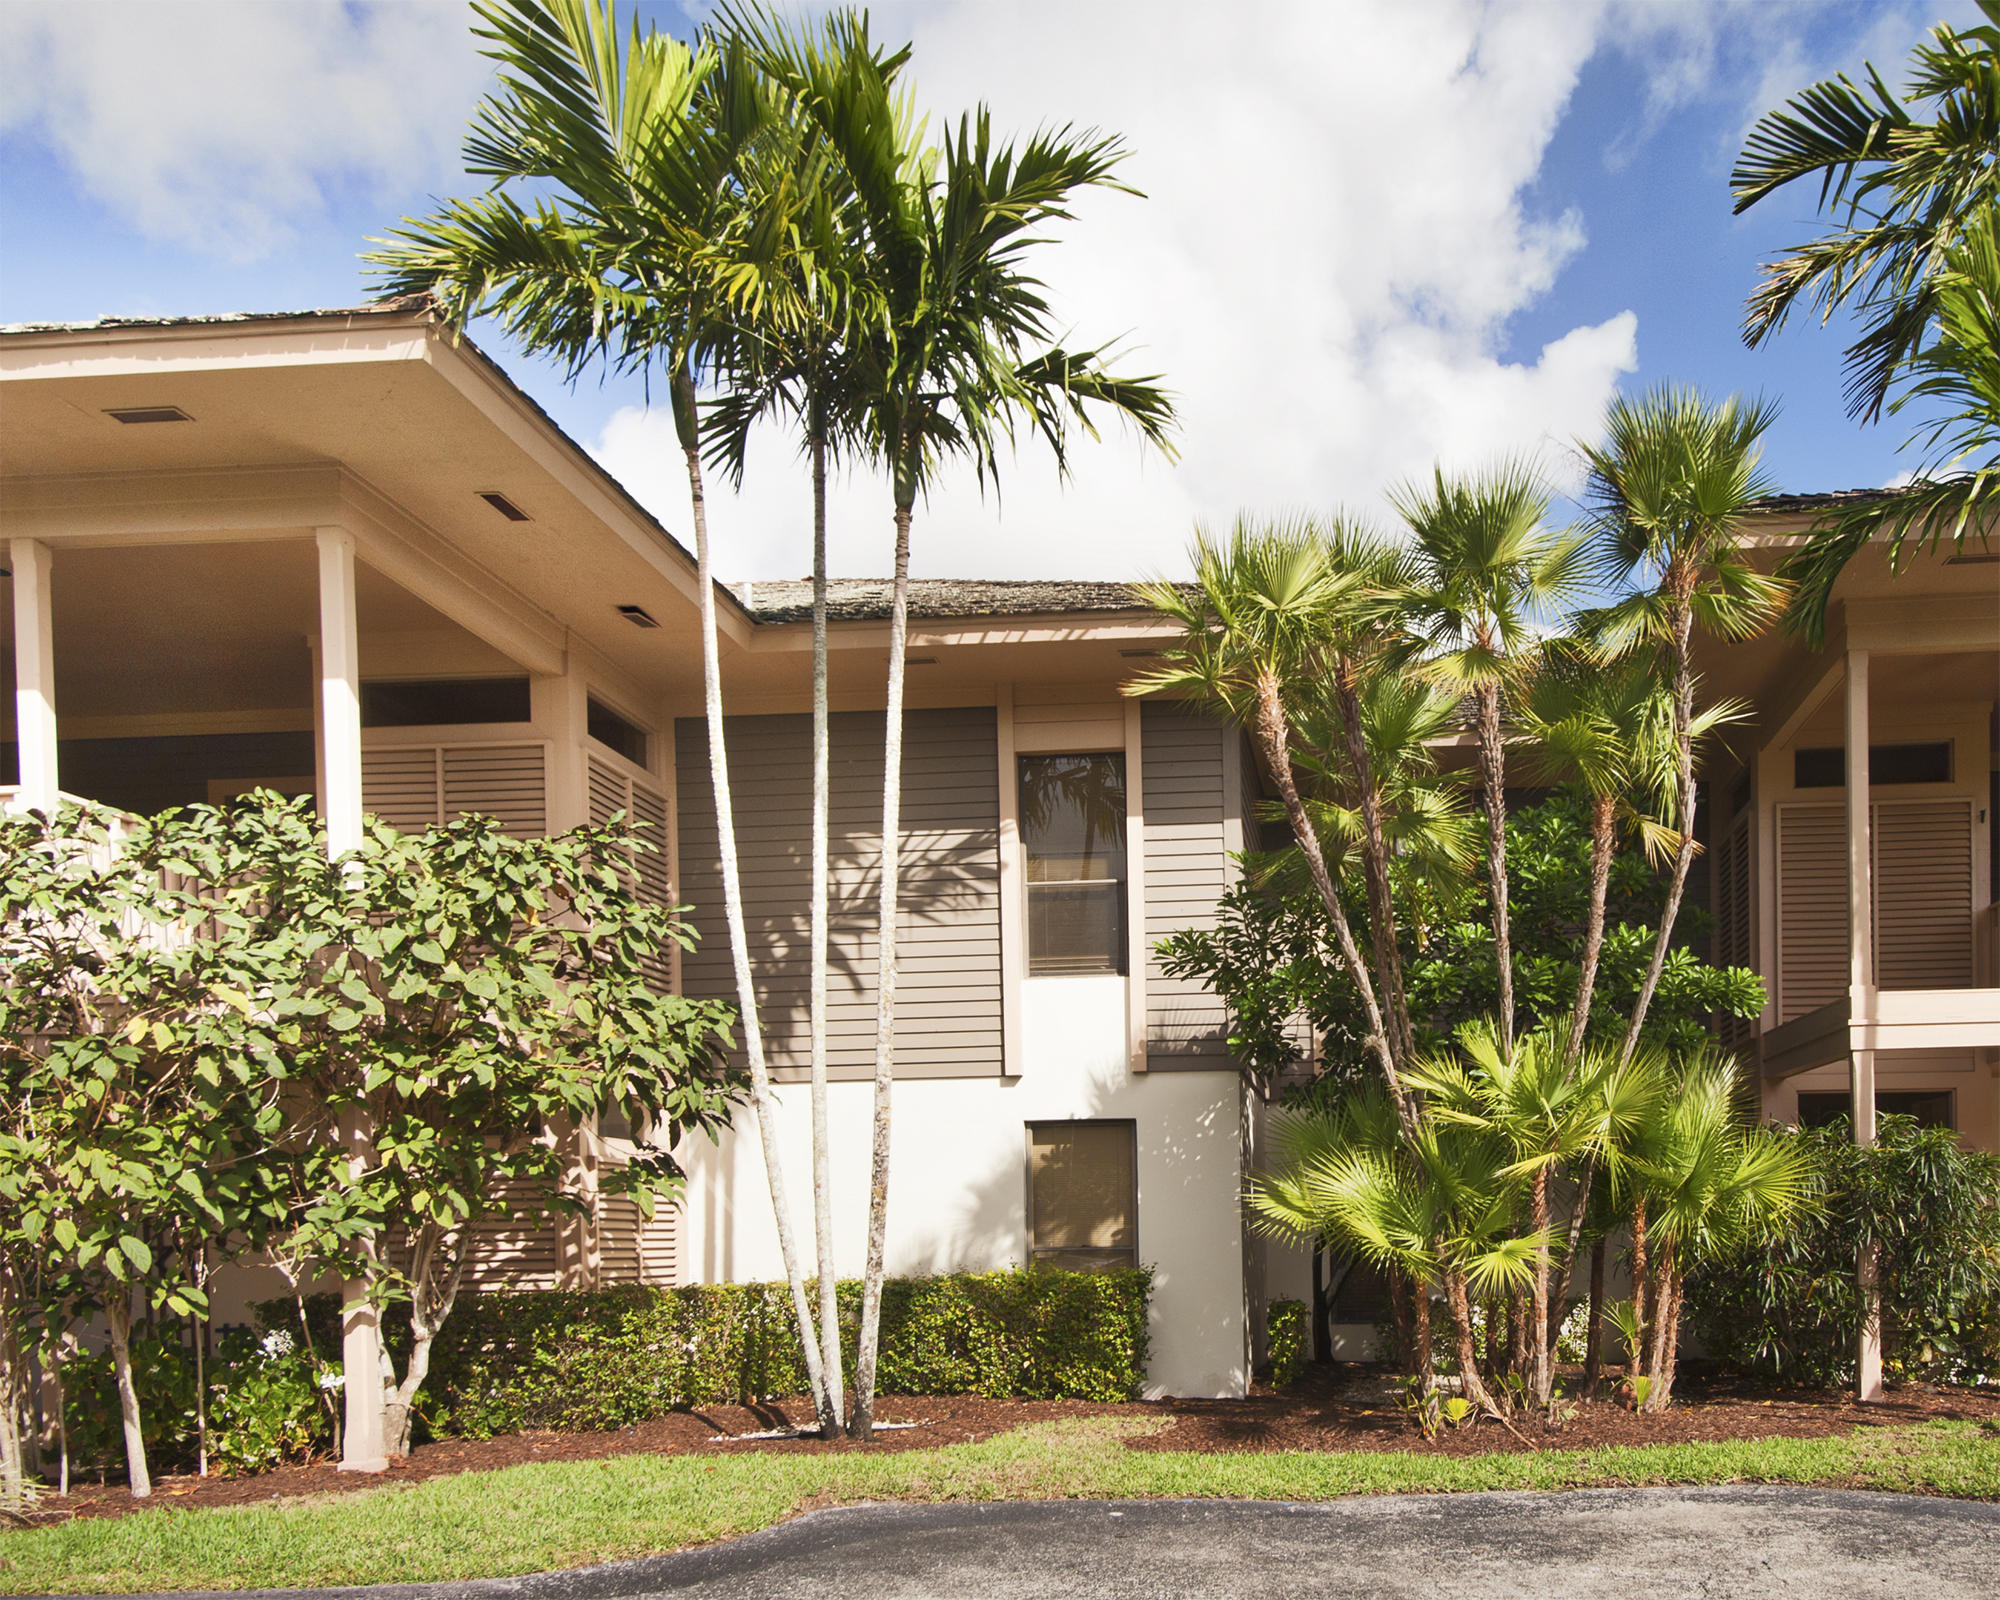 11842 Pebblewood Drive, Wellington, Florida 33414, 1 Bedroom Bedrooms, ,1 BathroomBathrooms,Condo/Coop,For Rent,PALM BEACH POLO,Pebblewood,2,RX-10515959